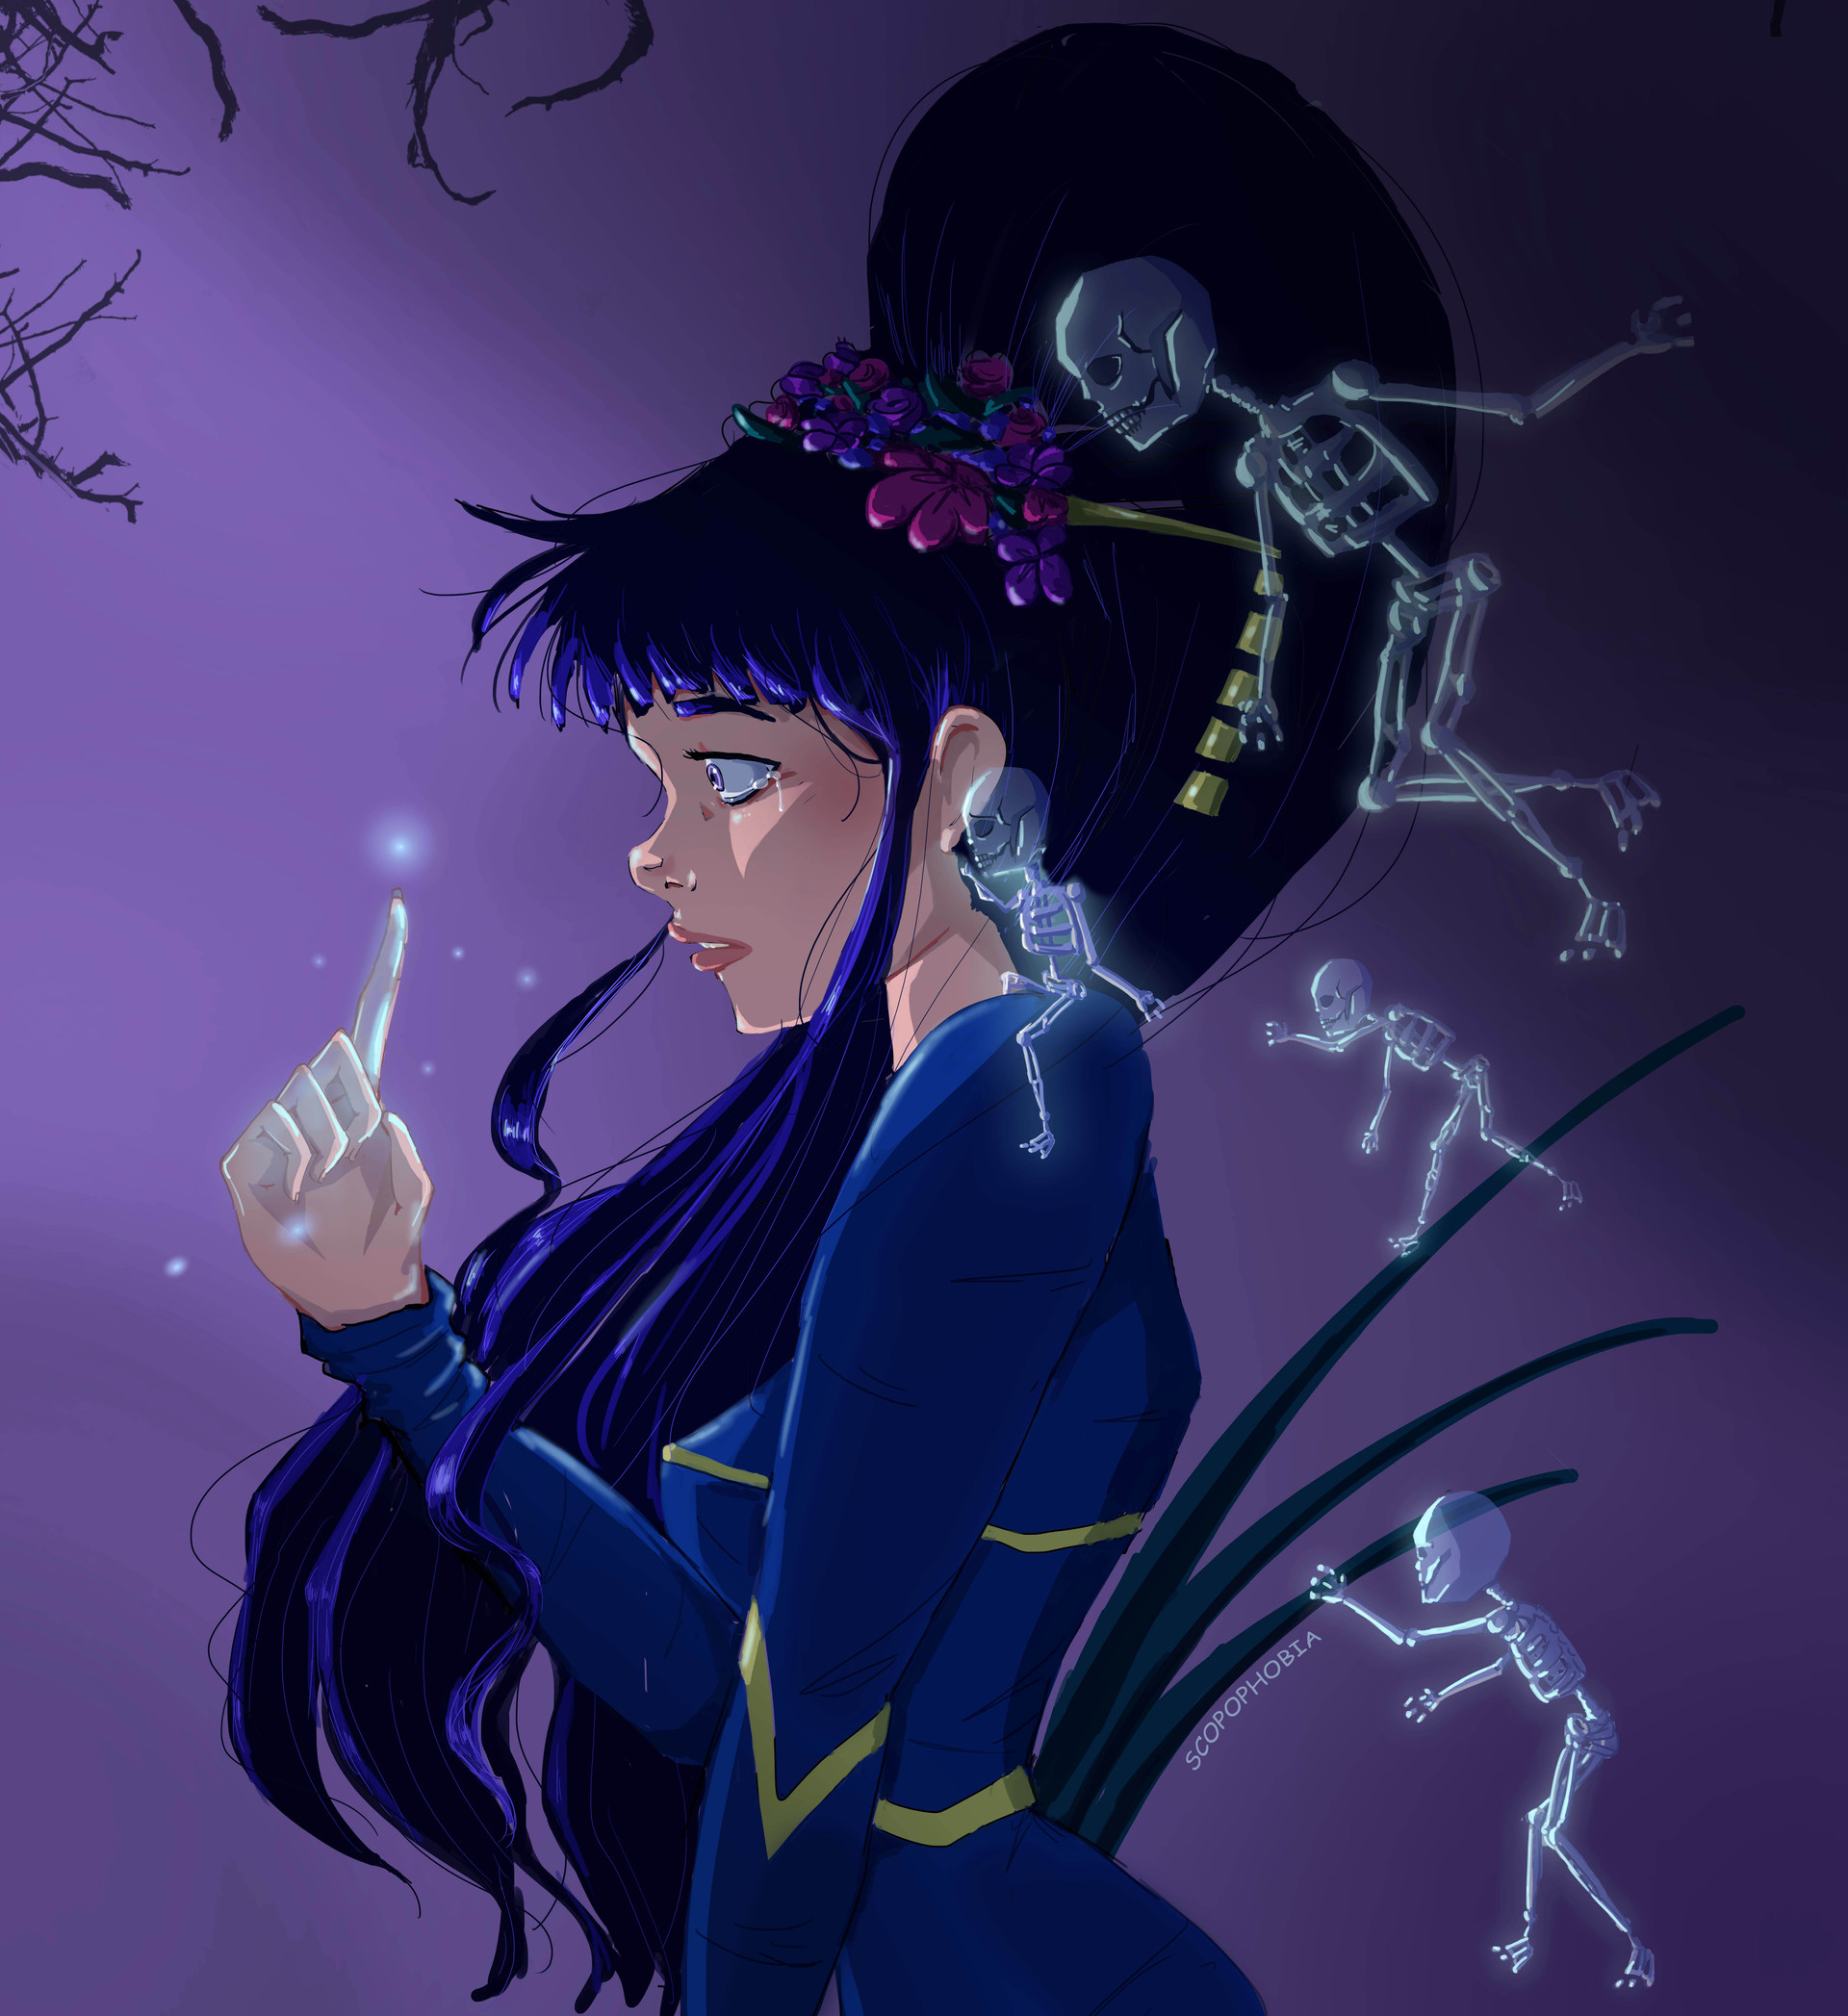 Persephone-Character Design/Illustration, 2018